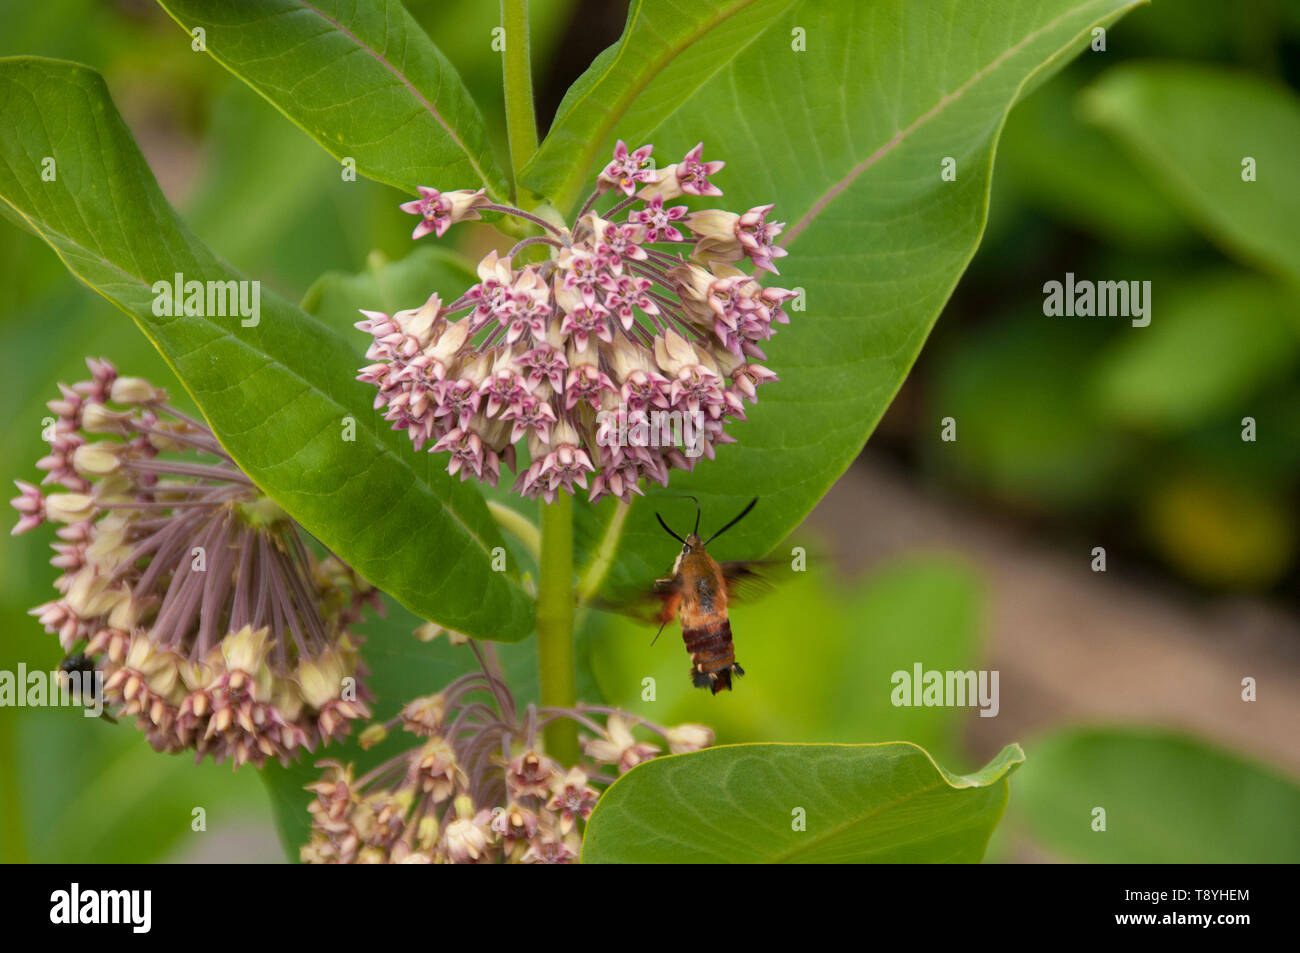 Hummingbird hawk-moth (Asclepias syriaca) feeding on Common Milkweed plant.  Bumblebee in background on separate blossom, near Thunder Bay, Ontario, C - Stock Image